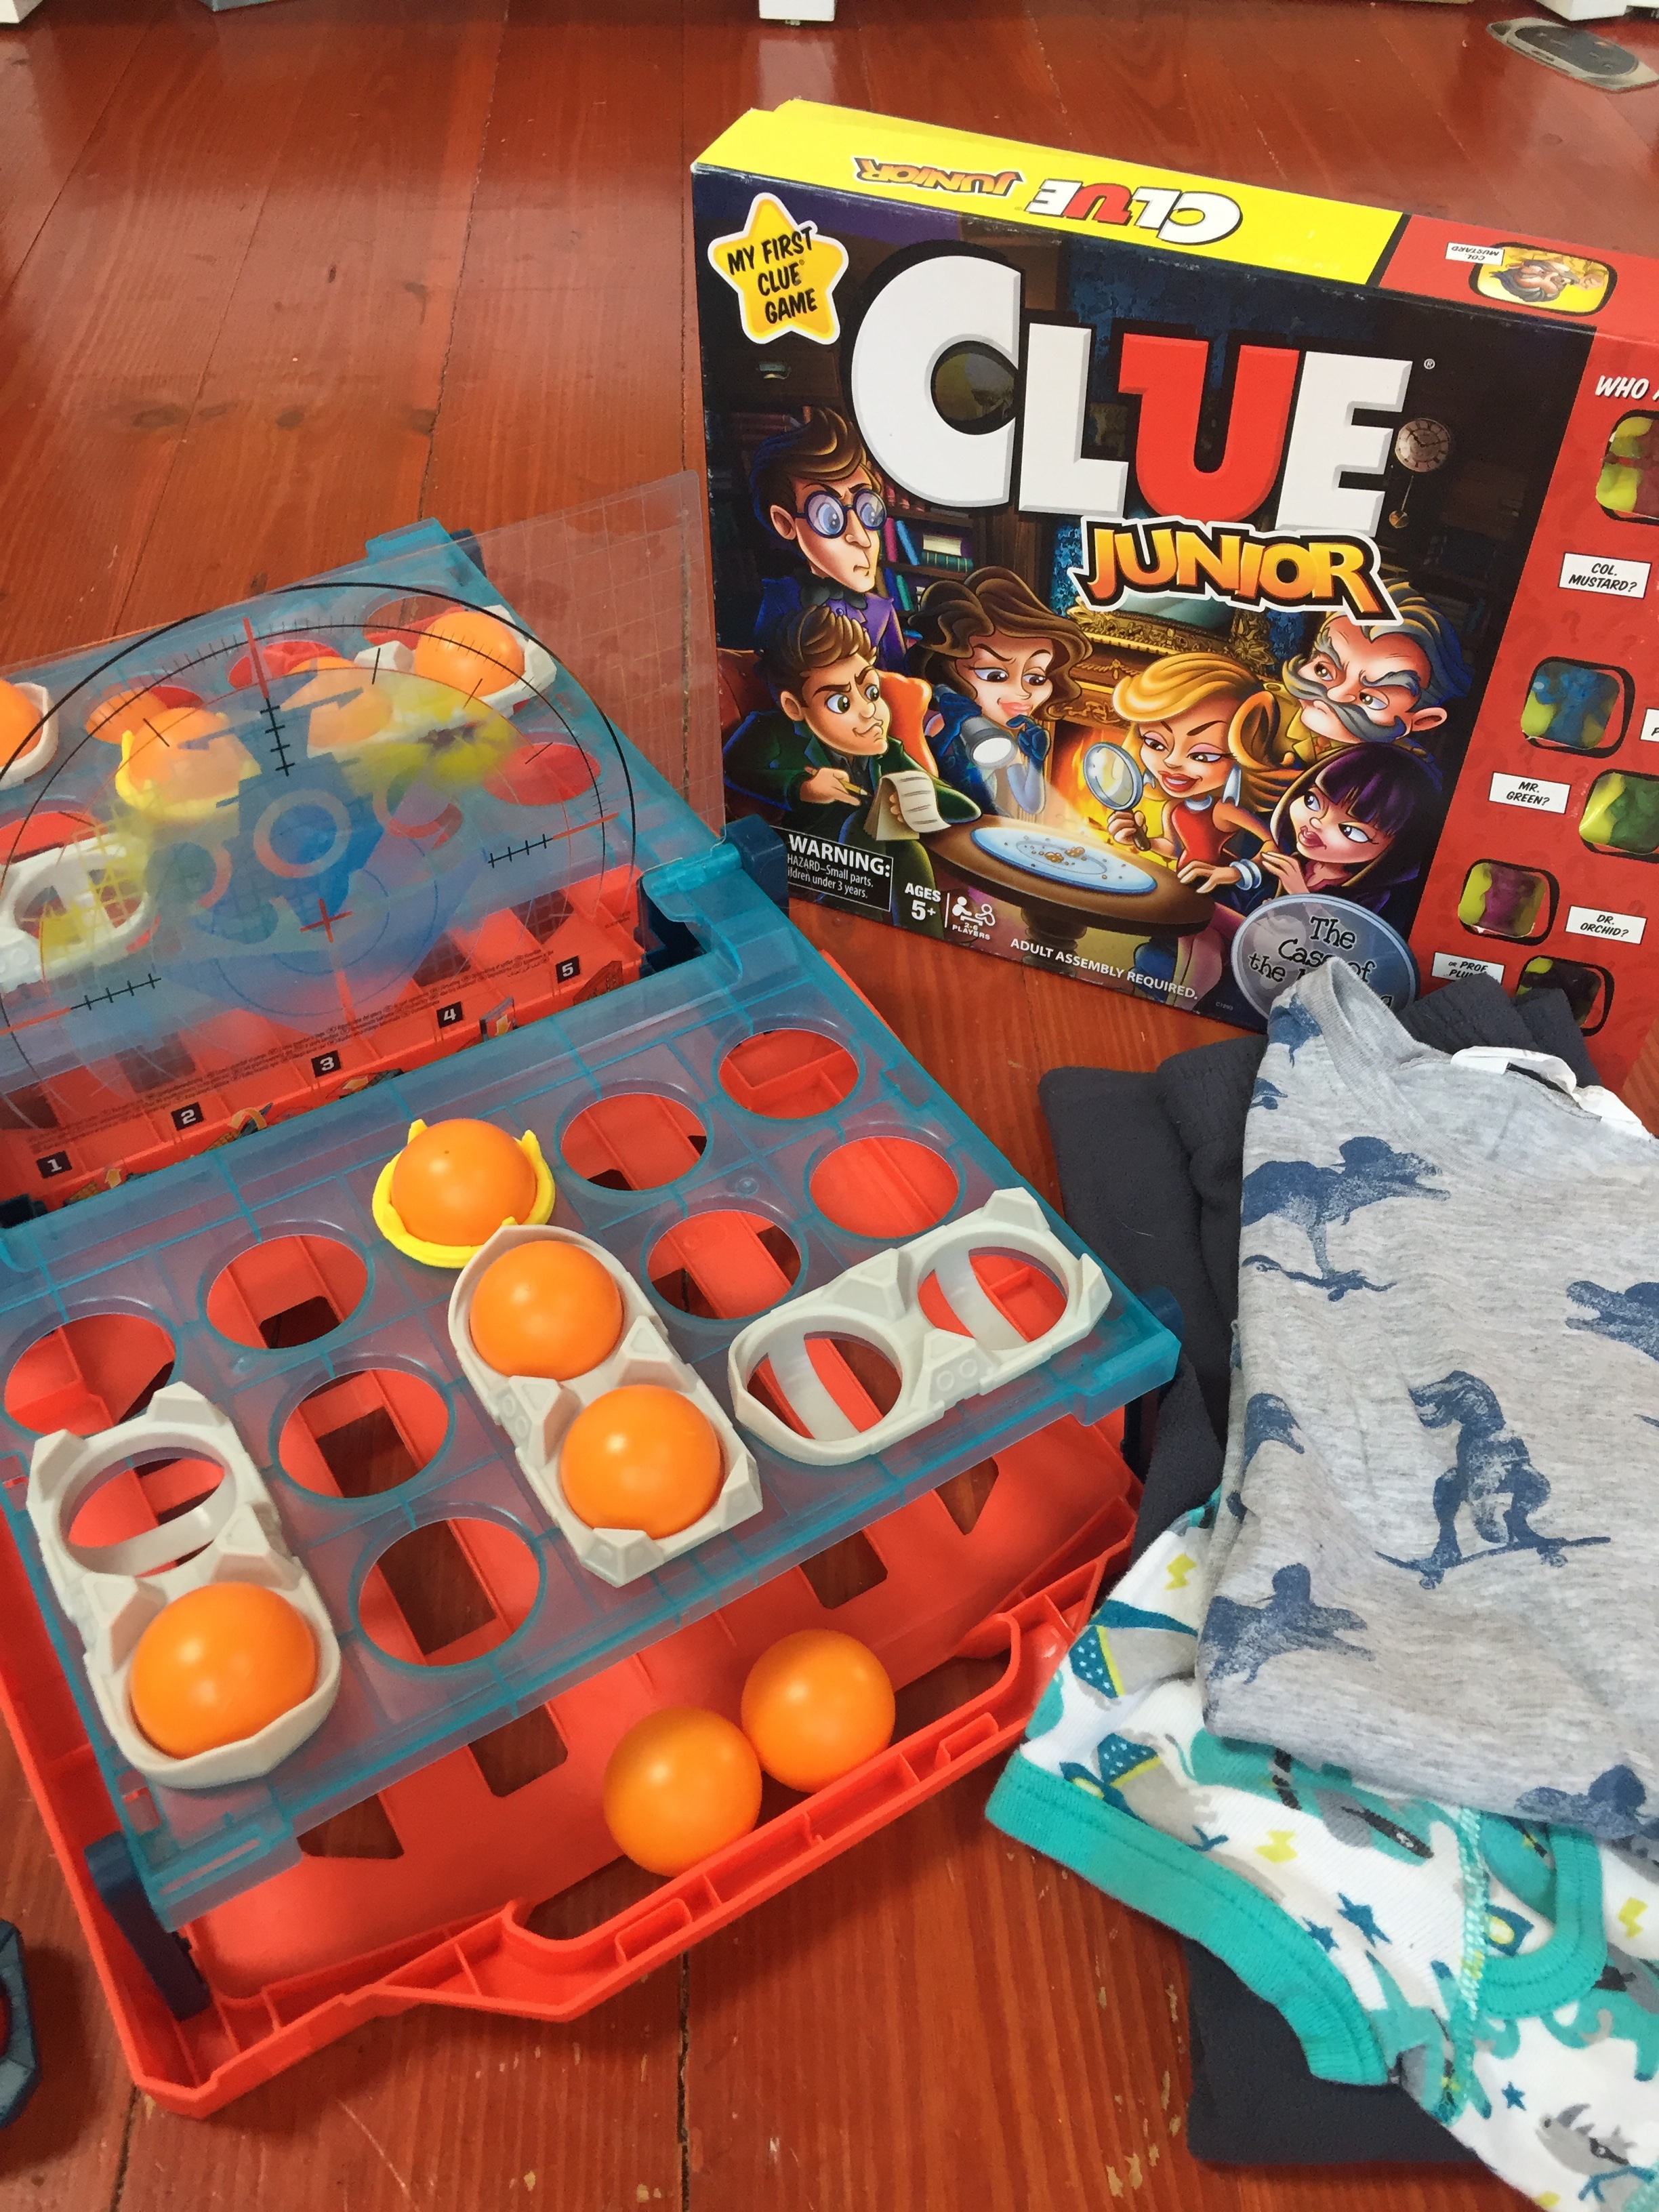 Clue Junior board game for kids, Battleship Shots